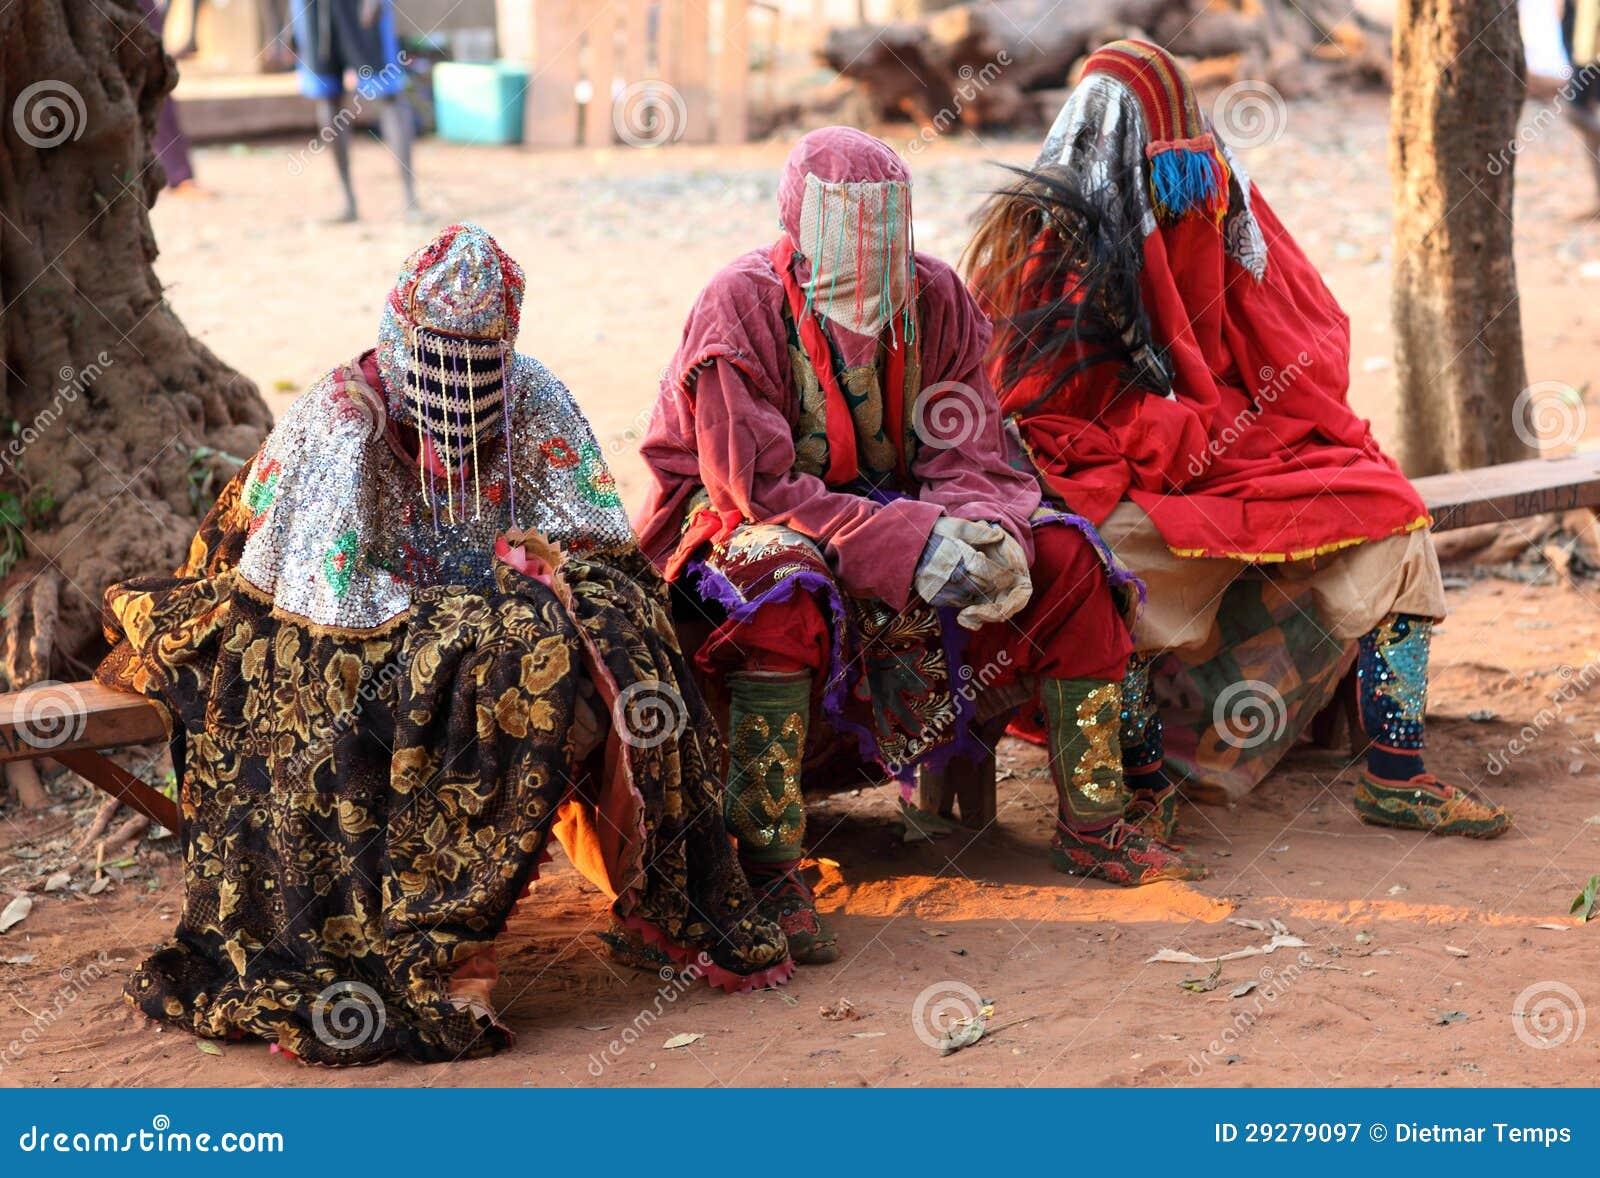 Voodoo amulet royalty free stock photos image 2718528 - Dan A Cerimonial Da M Scara Frica Fotografia De Stock Royalty Free